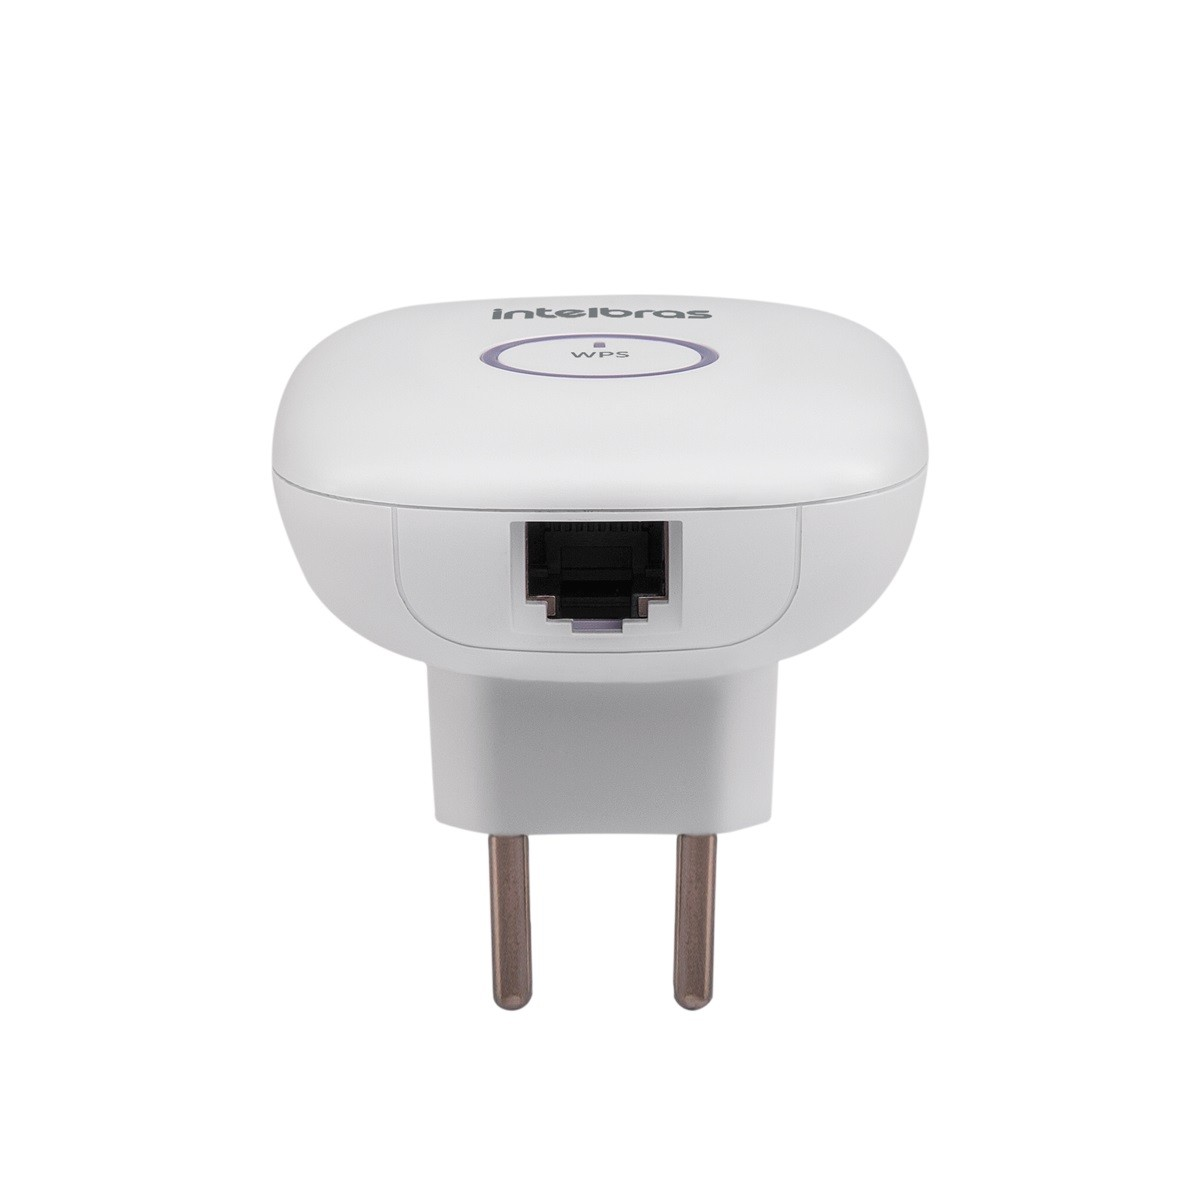 Repetidor de sinal wireless 300 Mbps IWE 3000N intelbras - JS Soluções em Segurança